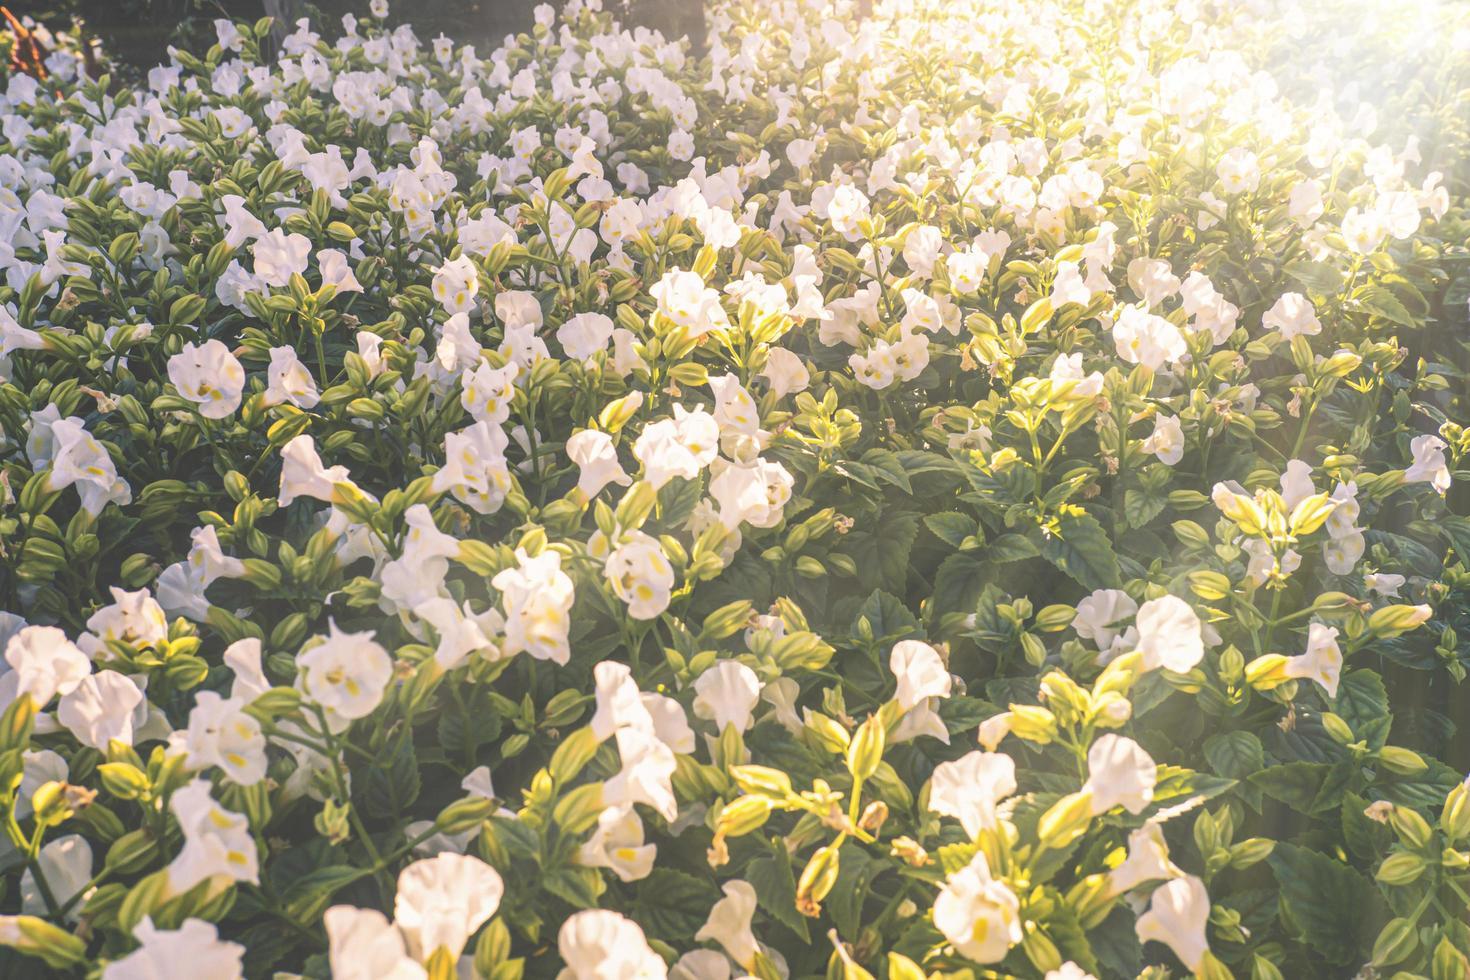 White flowers in sunlight photo